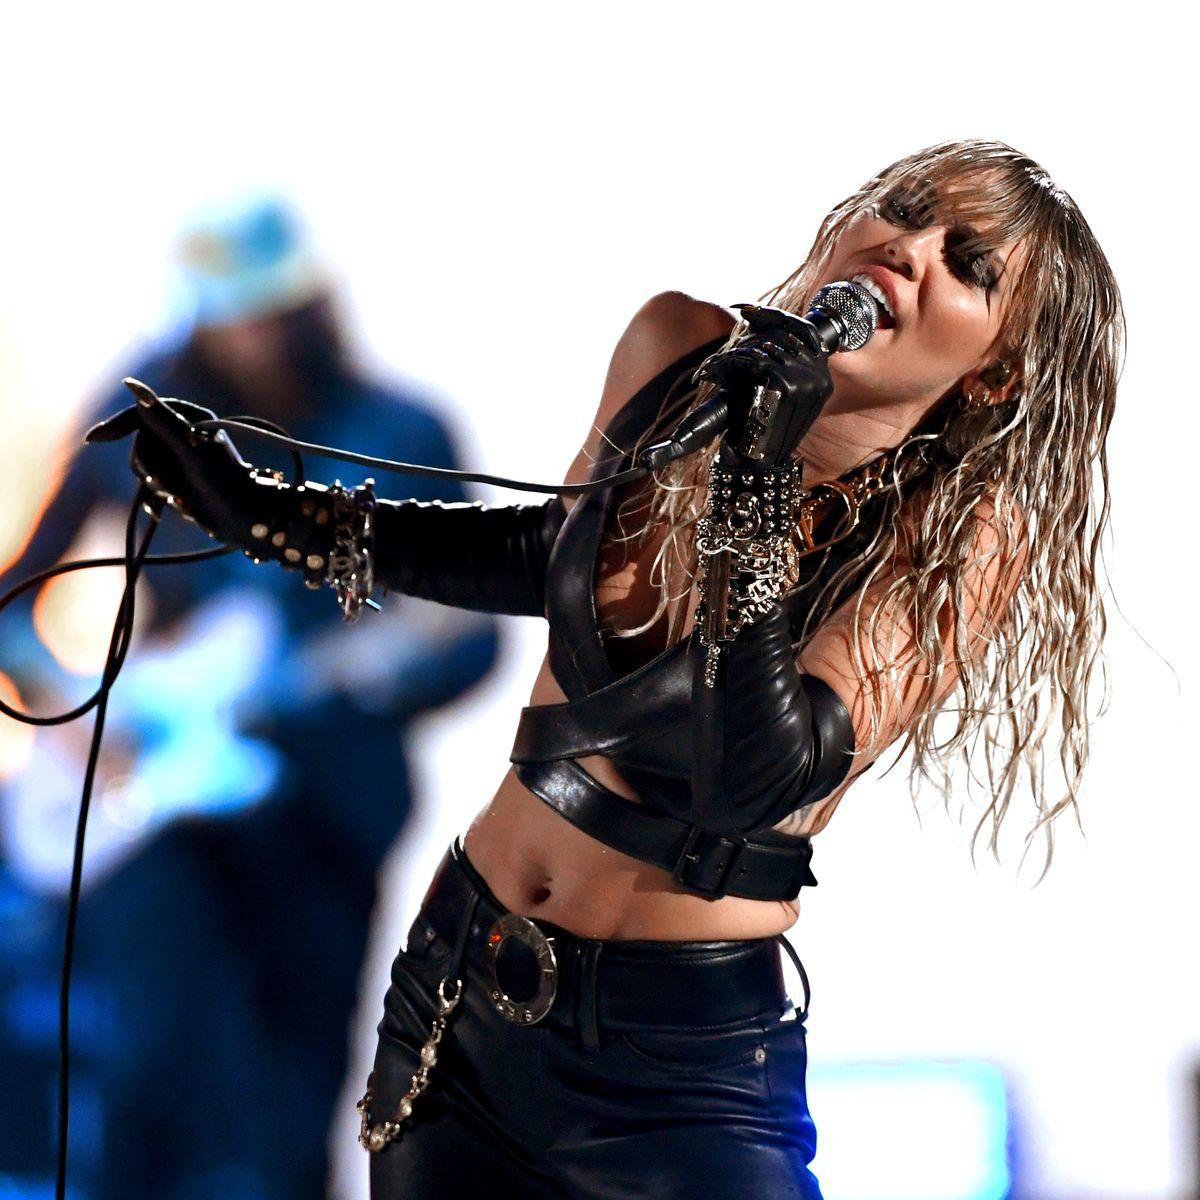 Vmas 2020 Miley Cyrus To Perform Midnight Sky